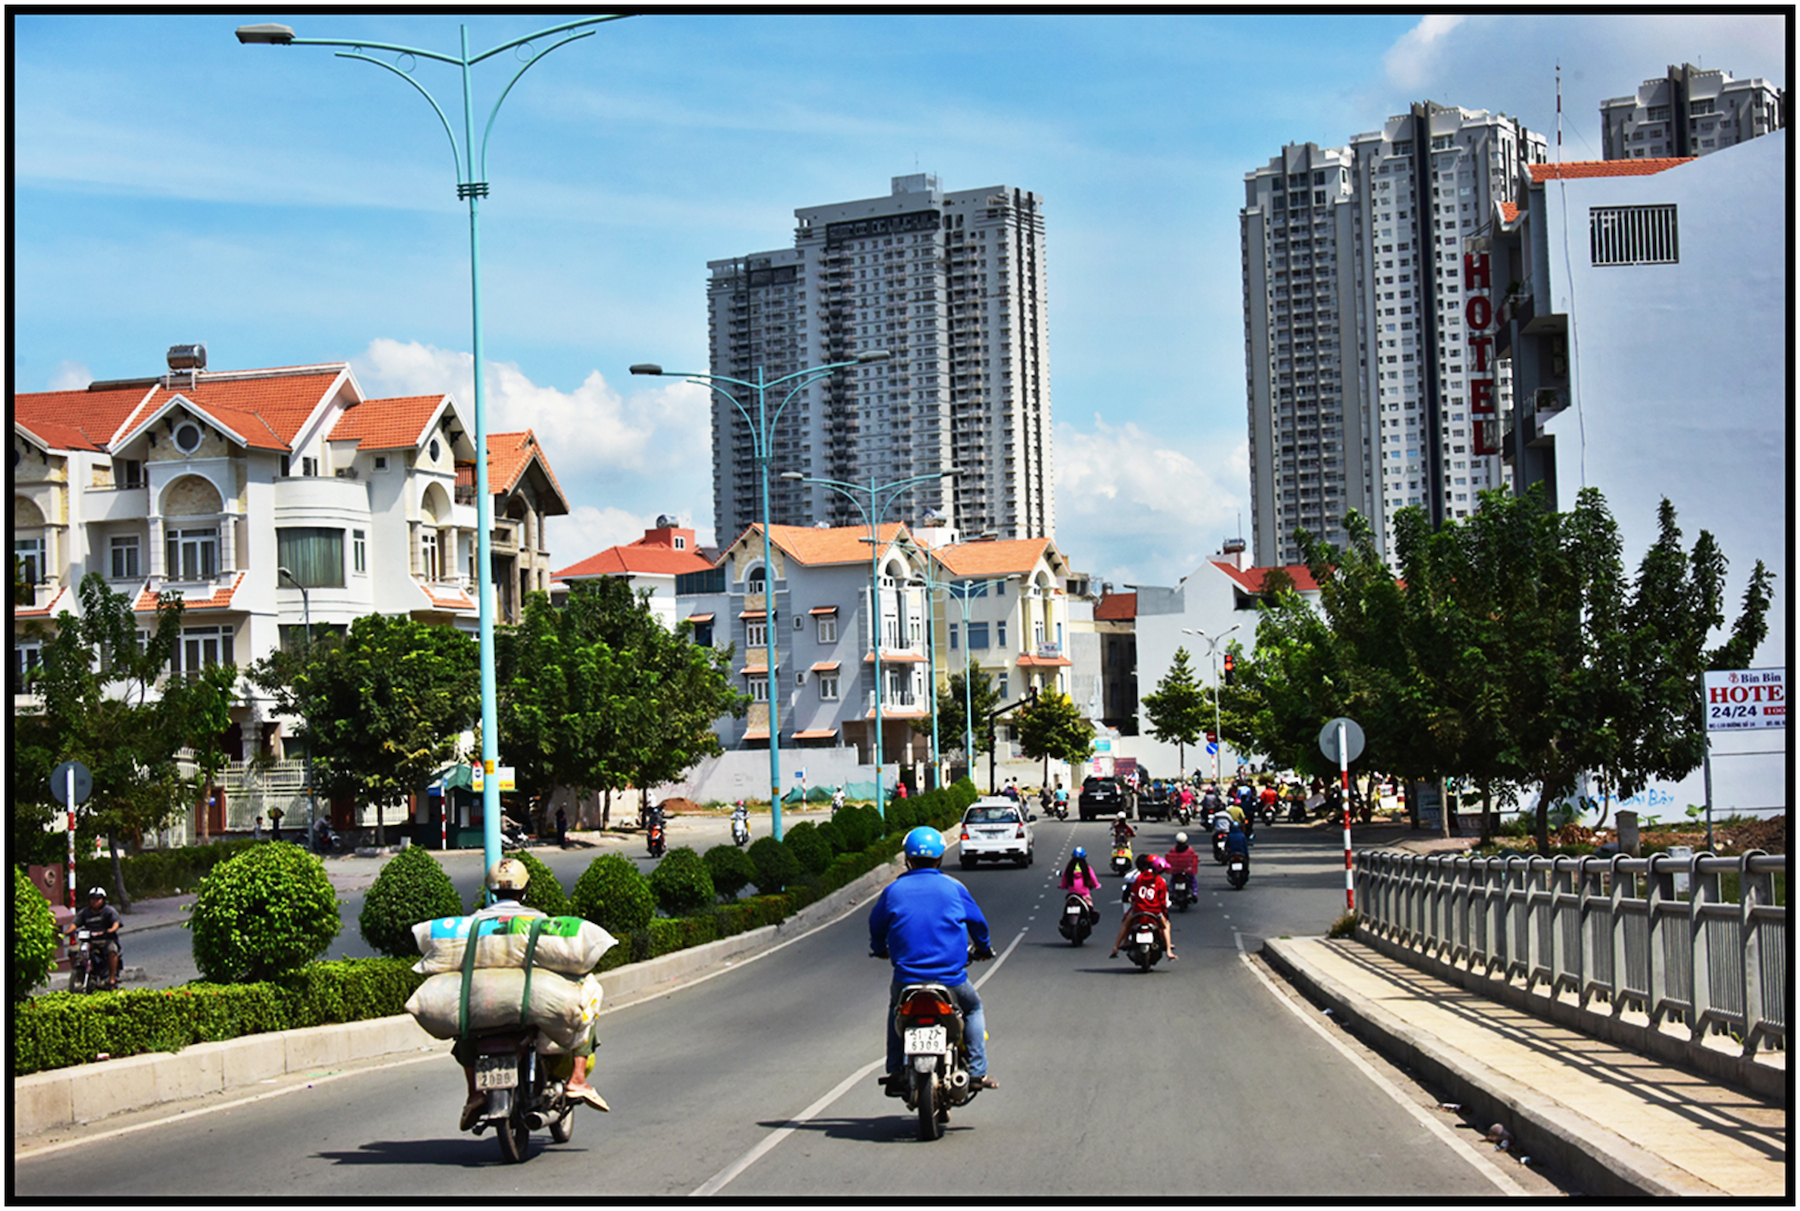 High and low rise luxury condo development, Saigon/HCMC. #5510